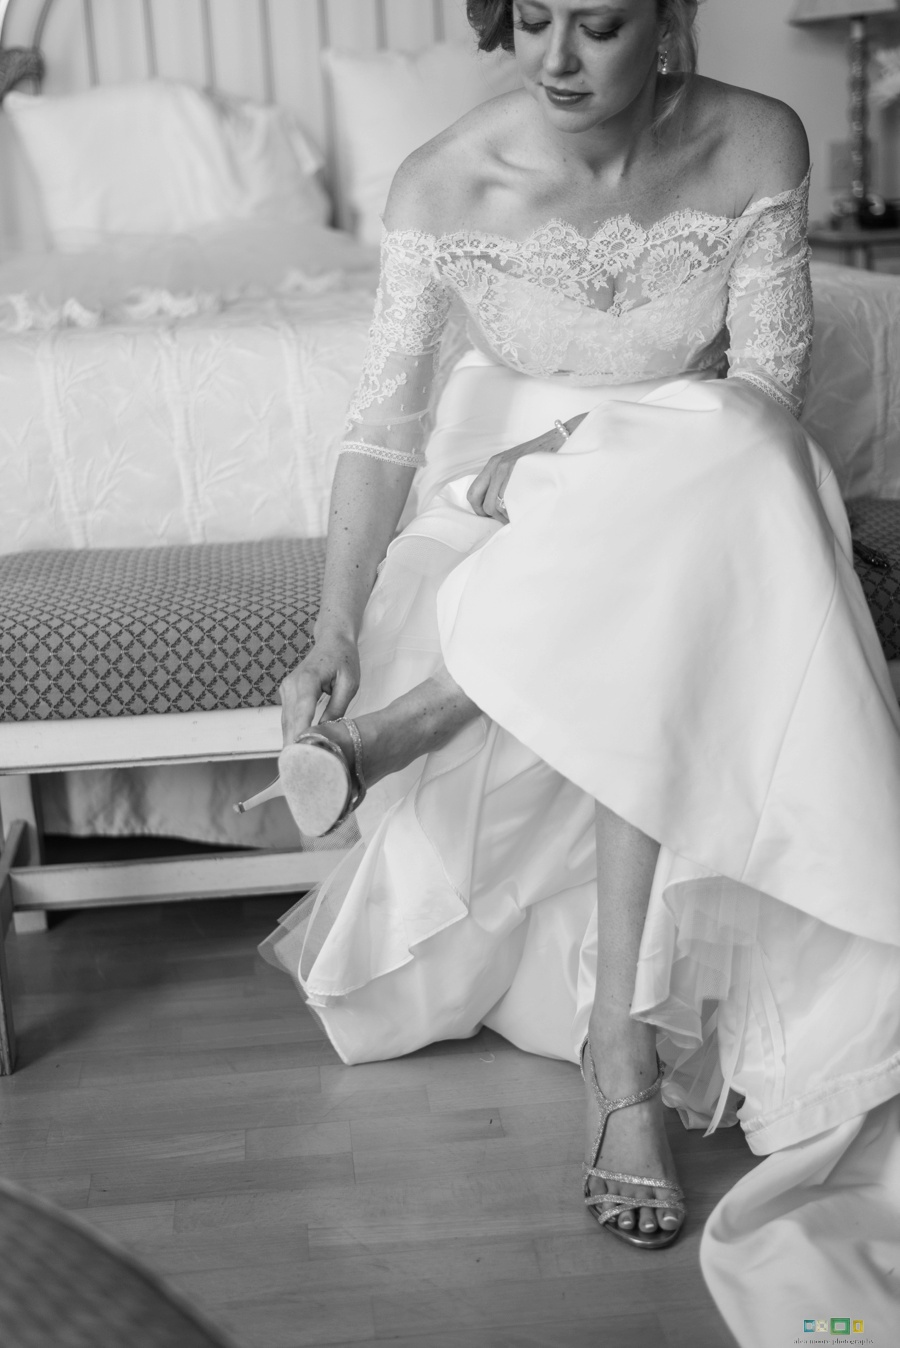 alea-moore-photography-Daufuskie-Island-wedding-ivory-and-beau-bridal-boutique-dakota-nicole-miller-rebecca-schoneveld-marisol-classic-southern-wedding-savannah-wedding-dresses-savannah-bridal-boutique-savannah-weddings-savannah-bridal-gowns-2.jpg